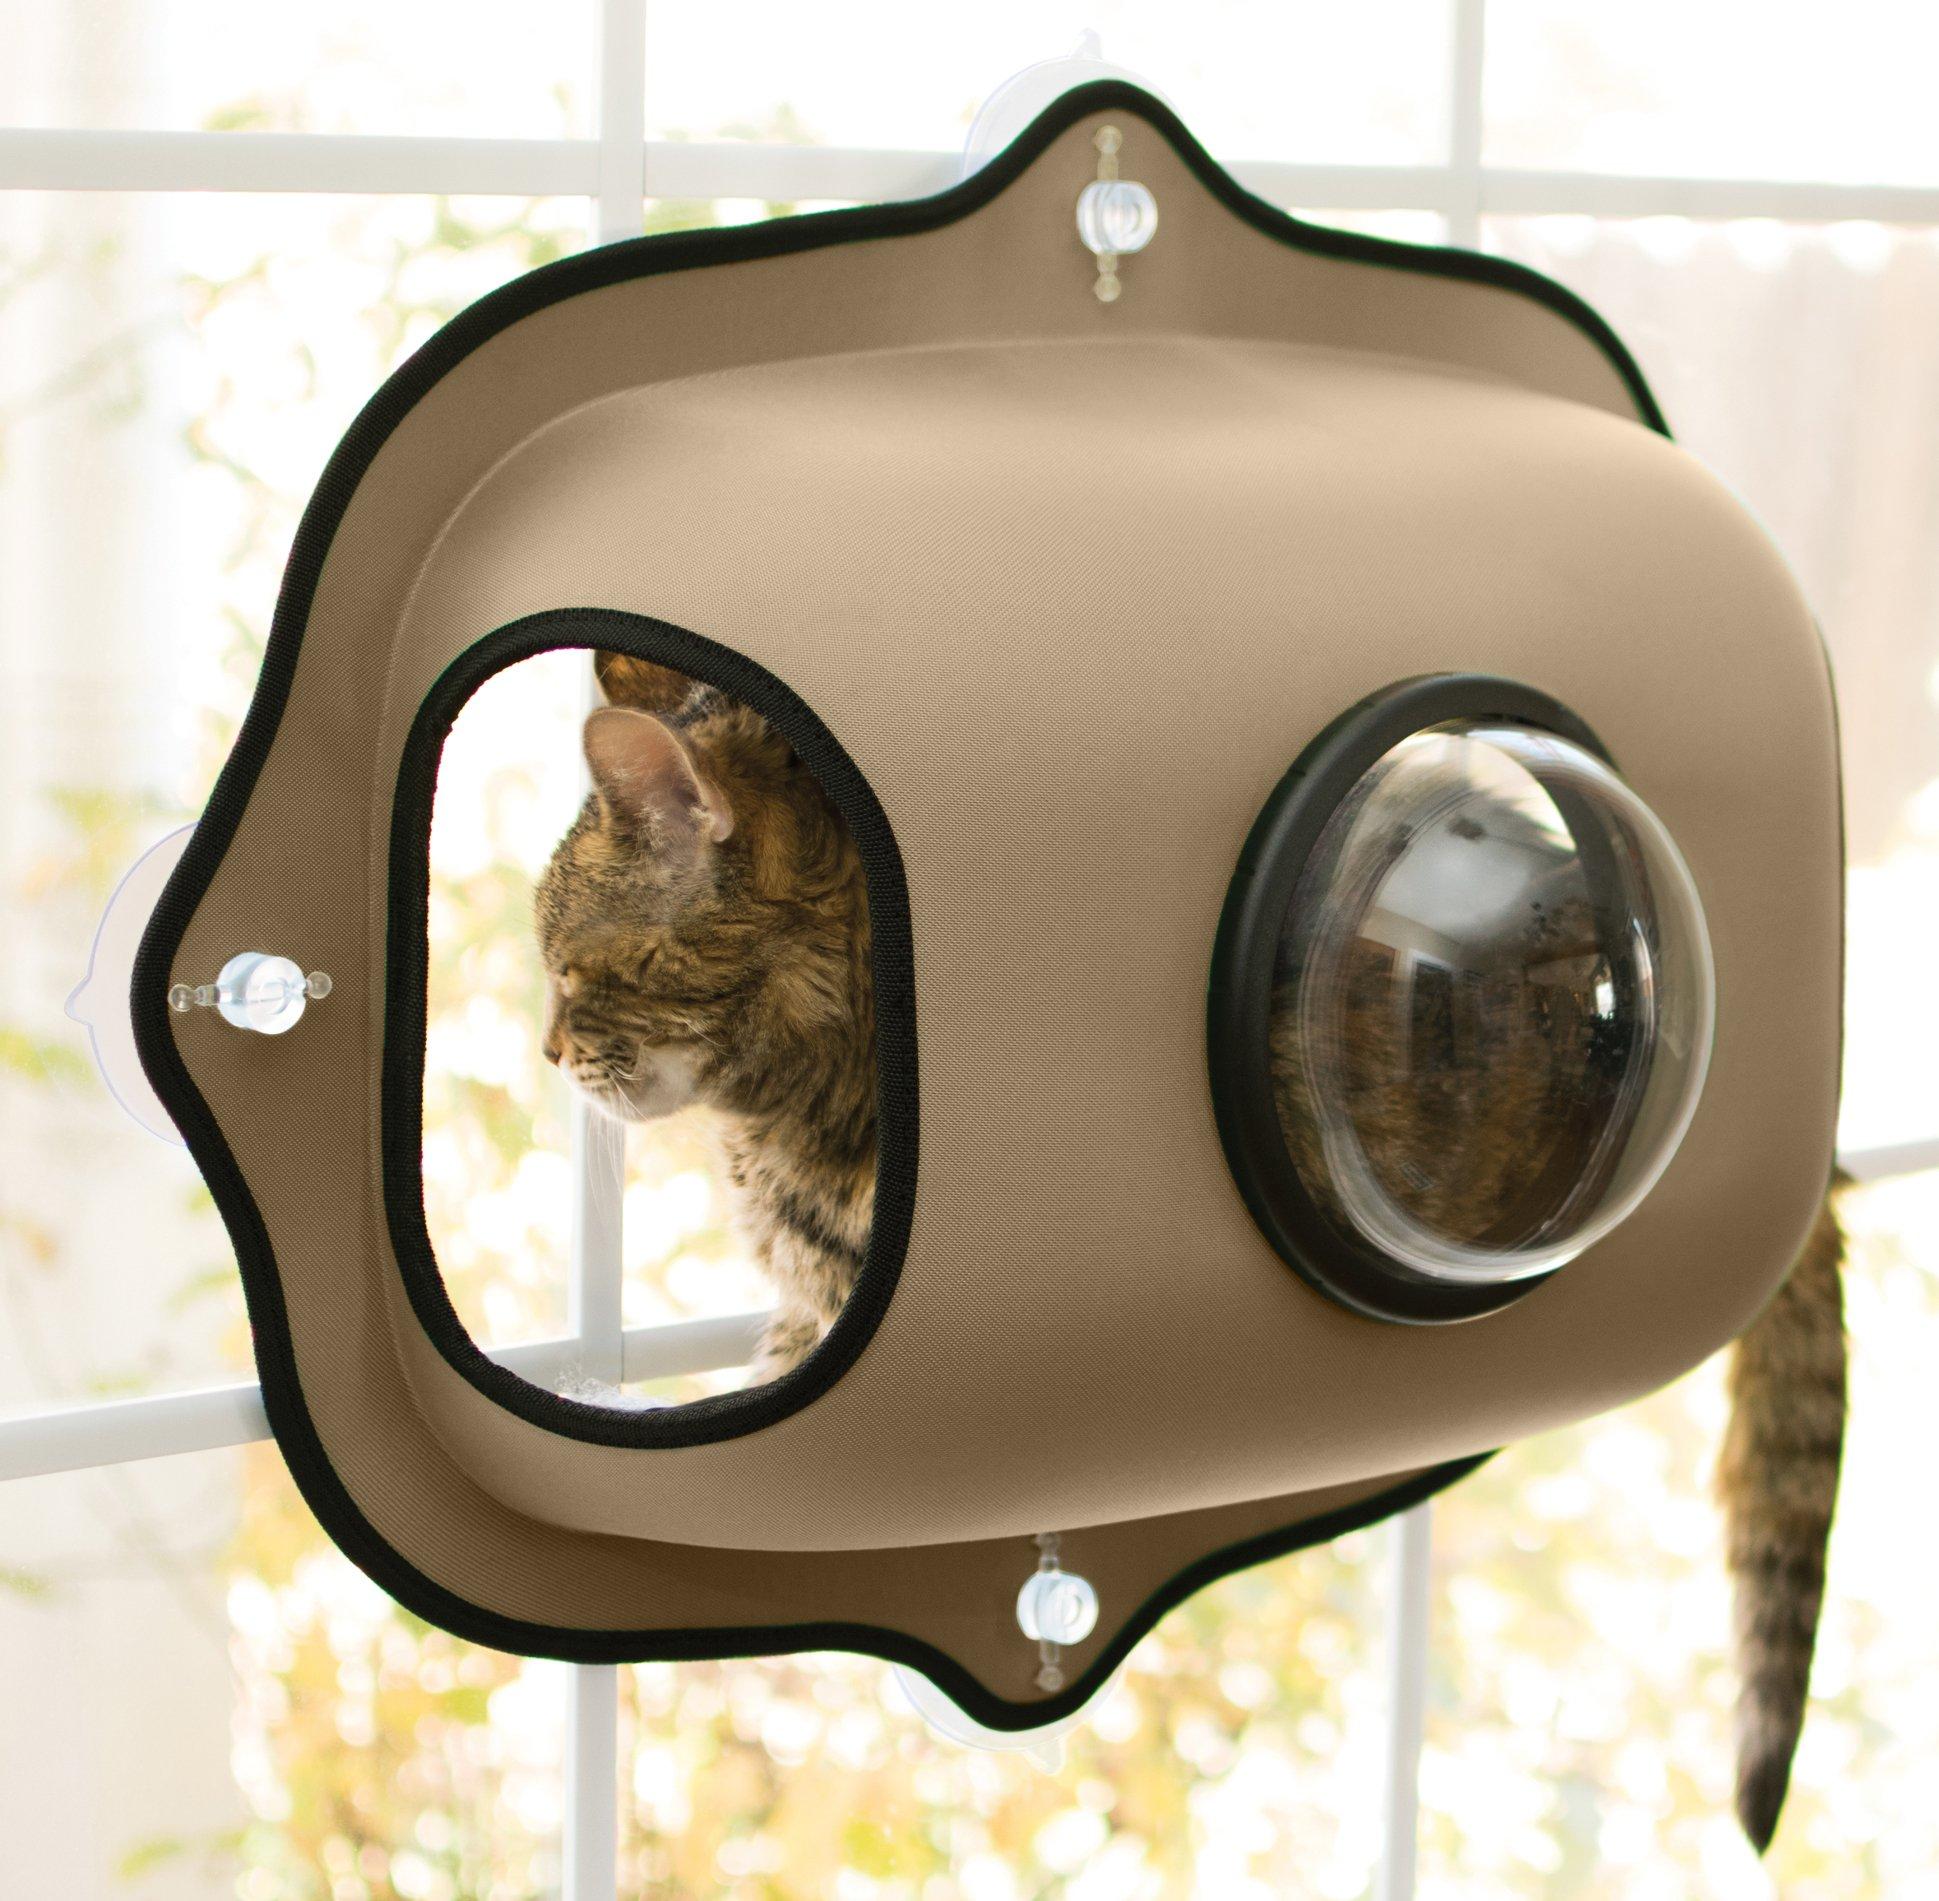 "K&H Pet Products EZ Mount Window Bubble Pod 27"" x 20"" x 6"" - Features Look Out Bubble Window product image"